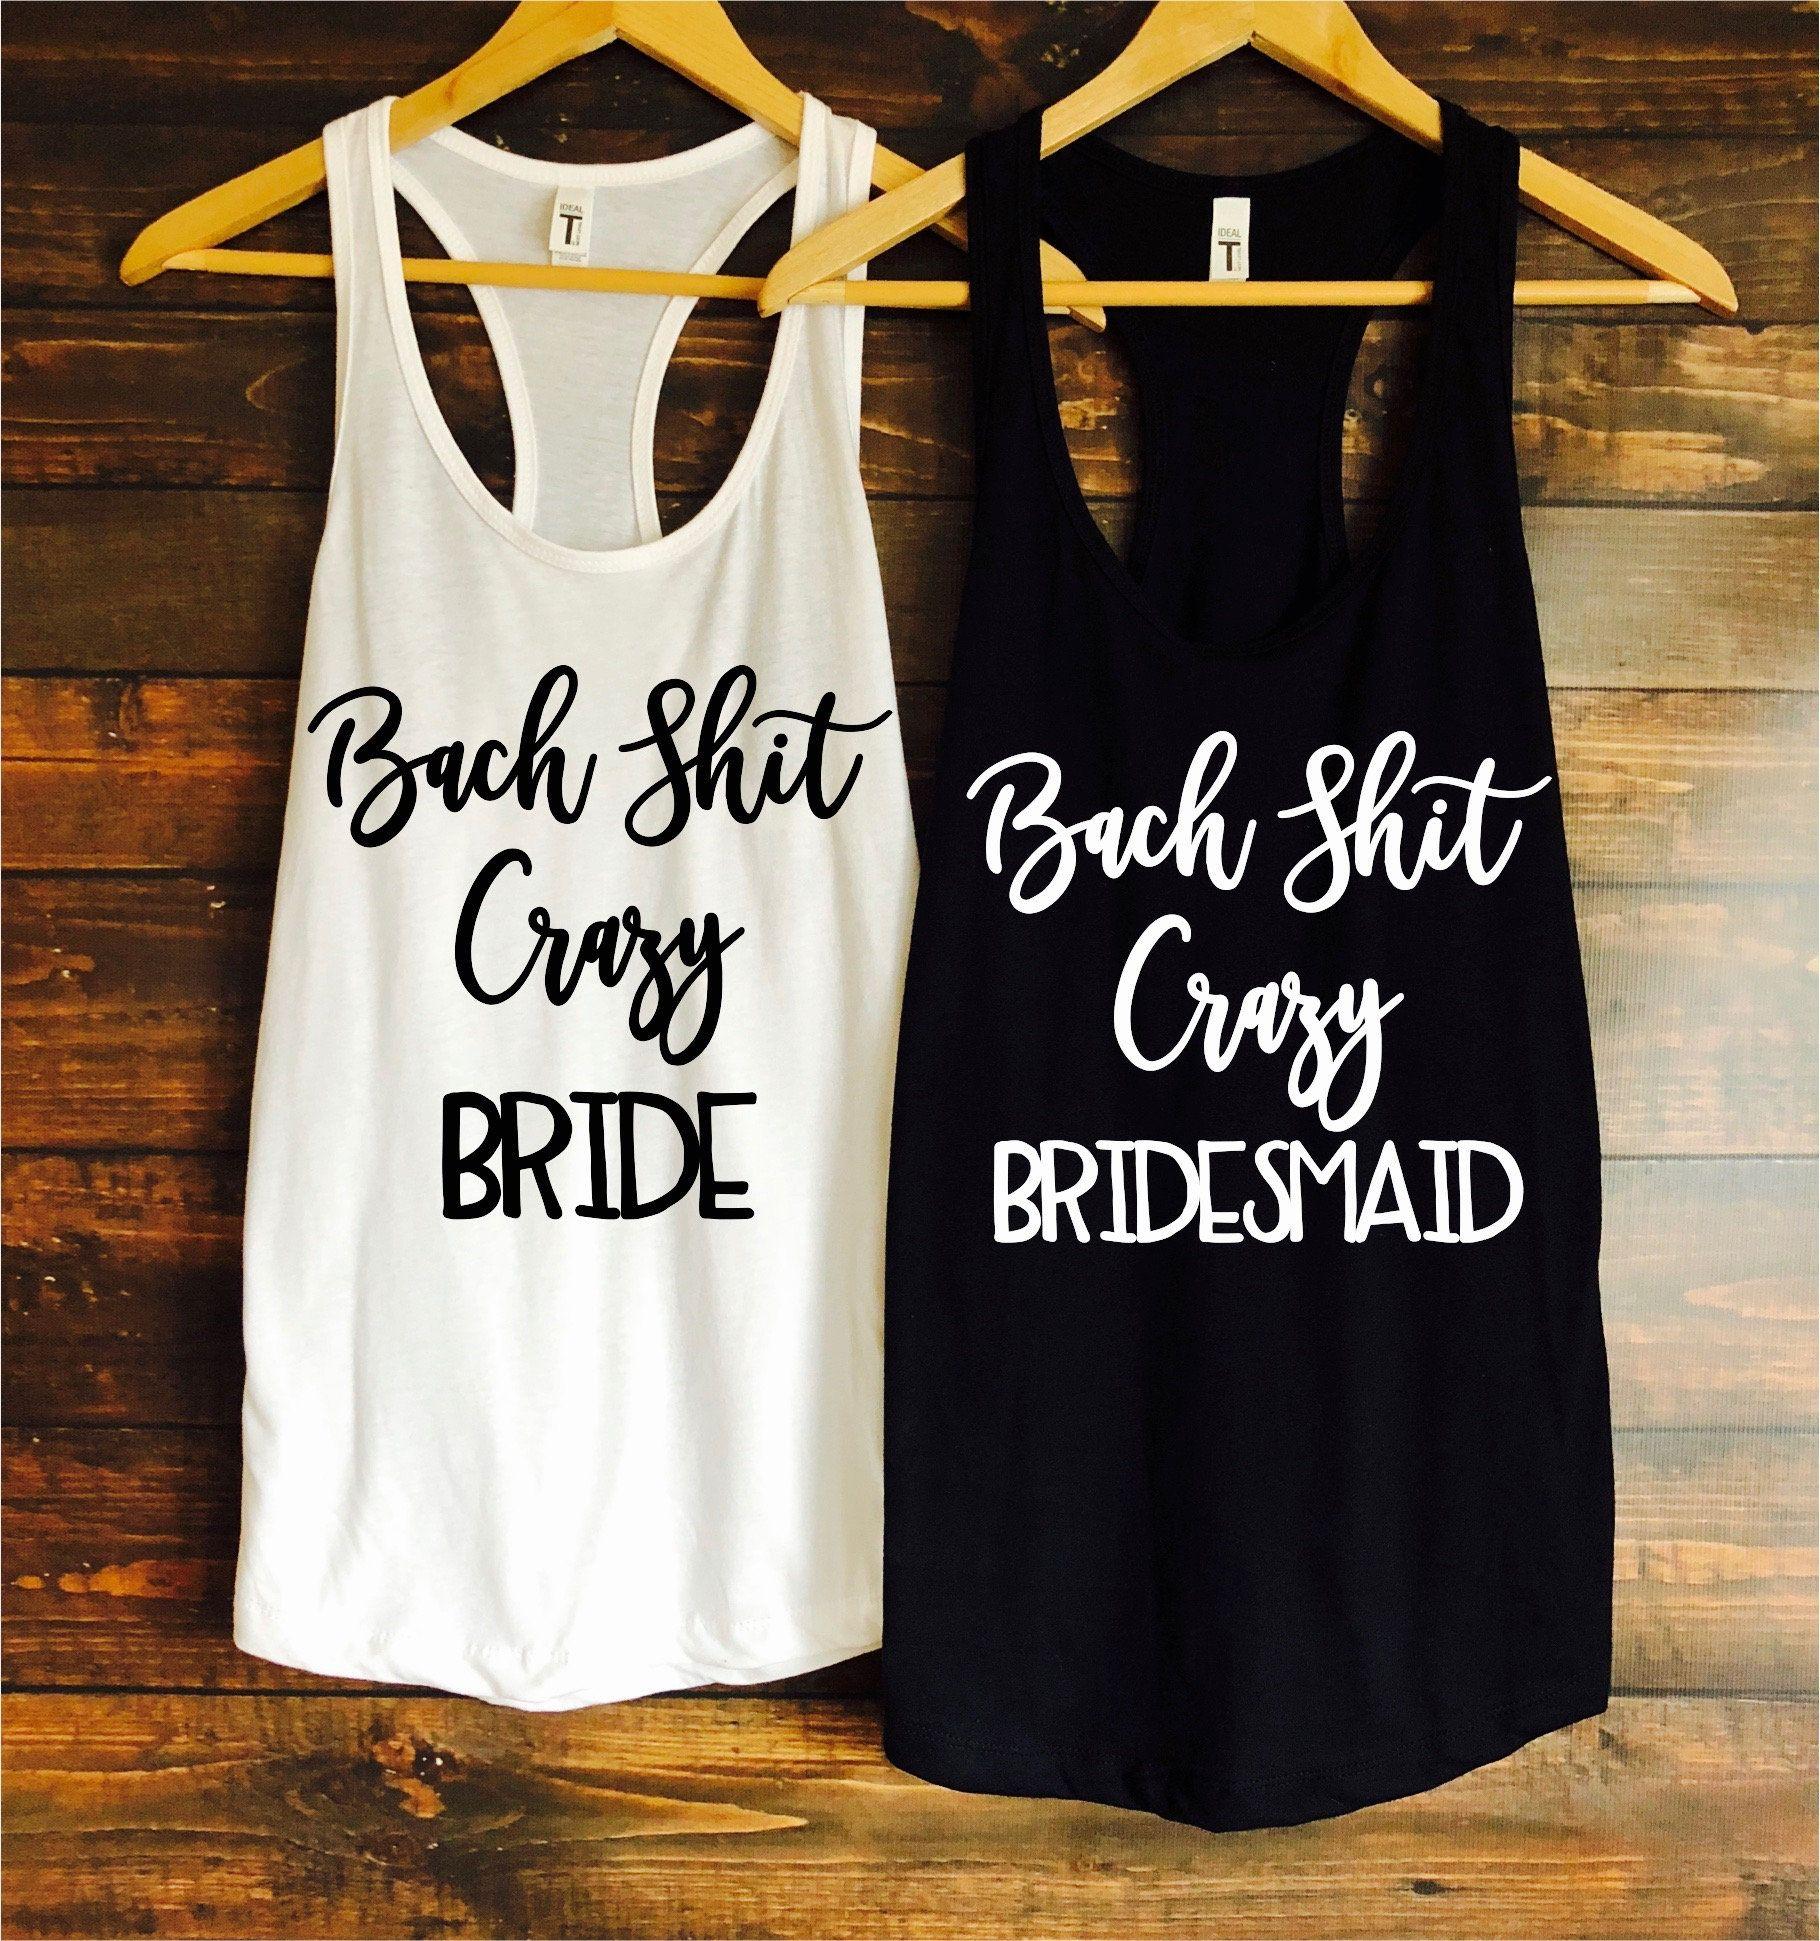 333c43d44 Bach shit crazy bride and bridesmaids tanks - bachelorette party shirts  favors - wedding shirts - bridesmaid shirts - bride shirts by  TheBridesLastBash on ...